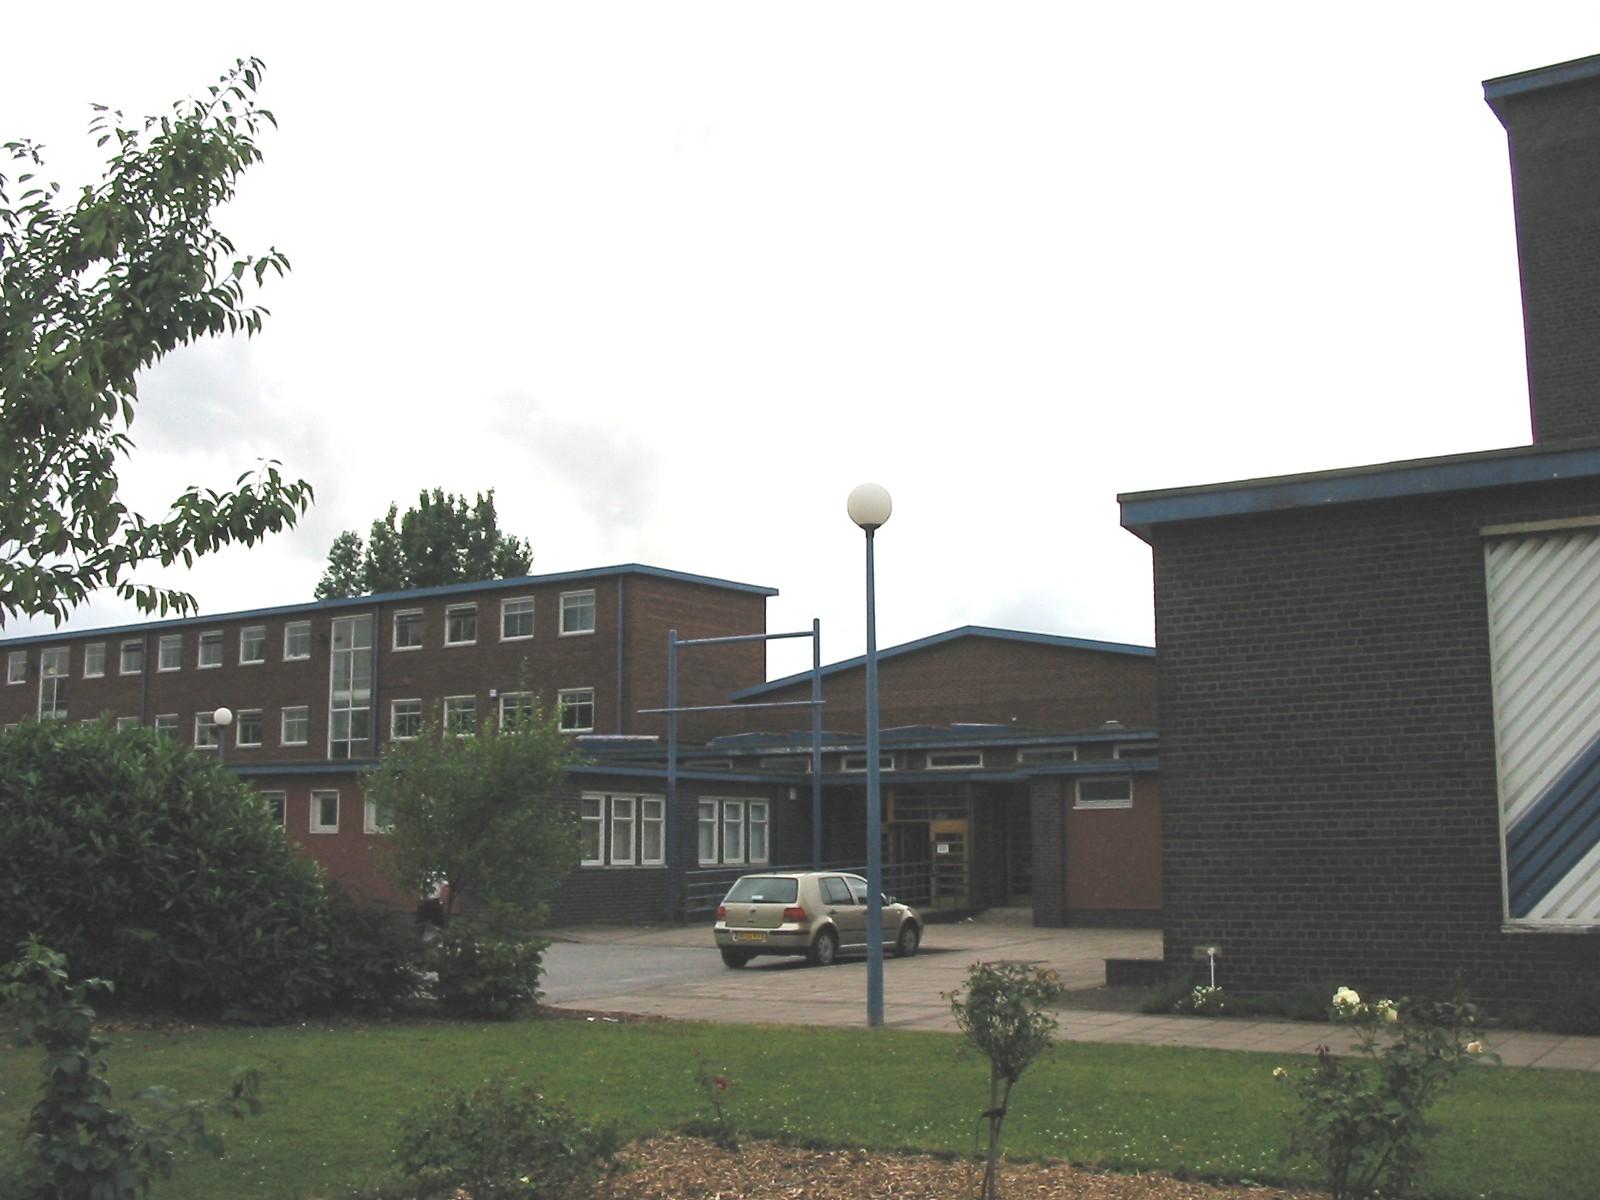 Main photo for Warrington Business Park Ltd